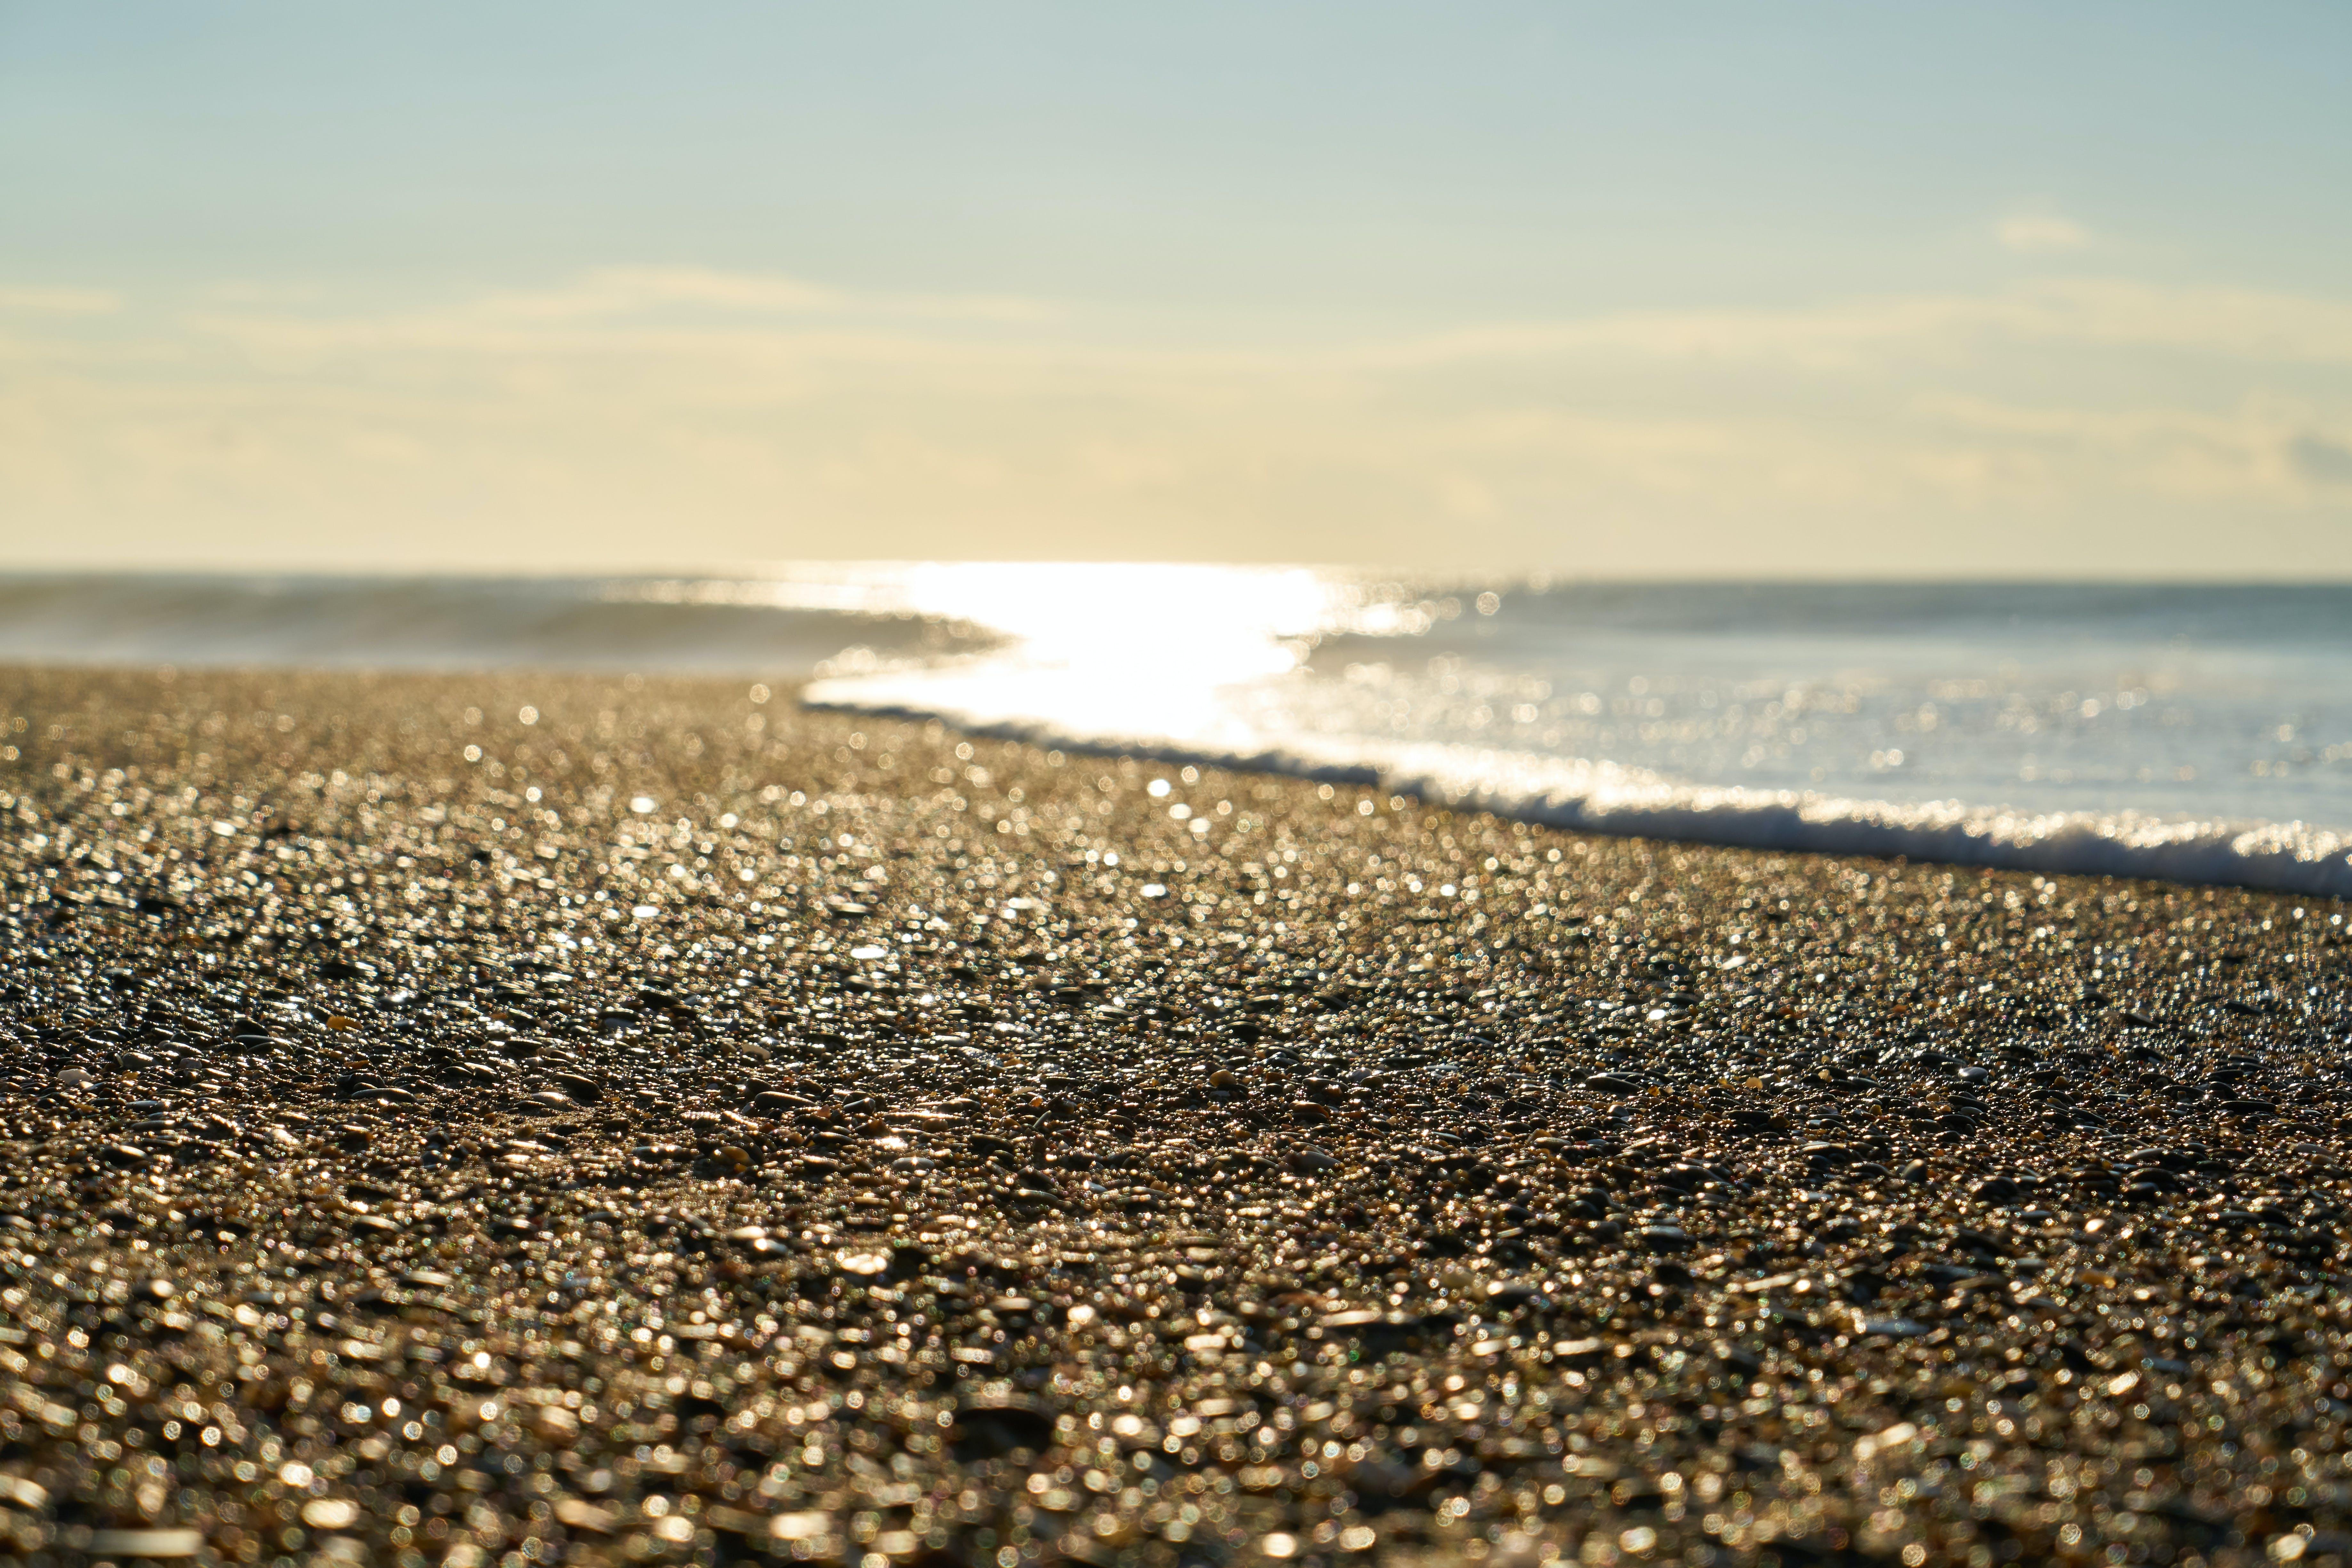 Close-up Photo of Seashore